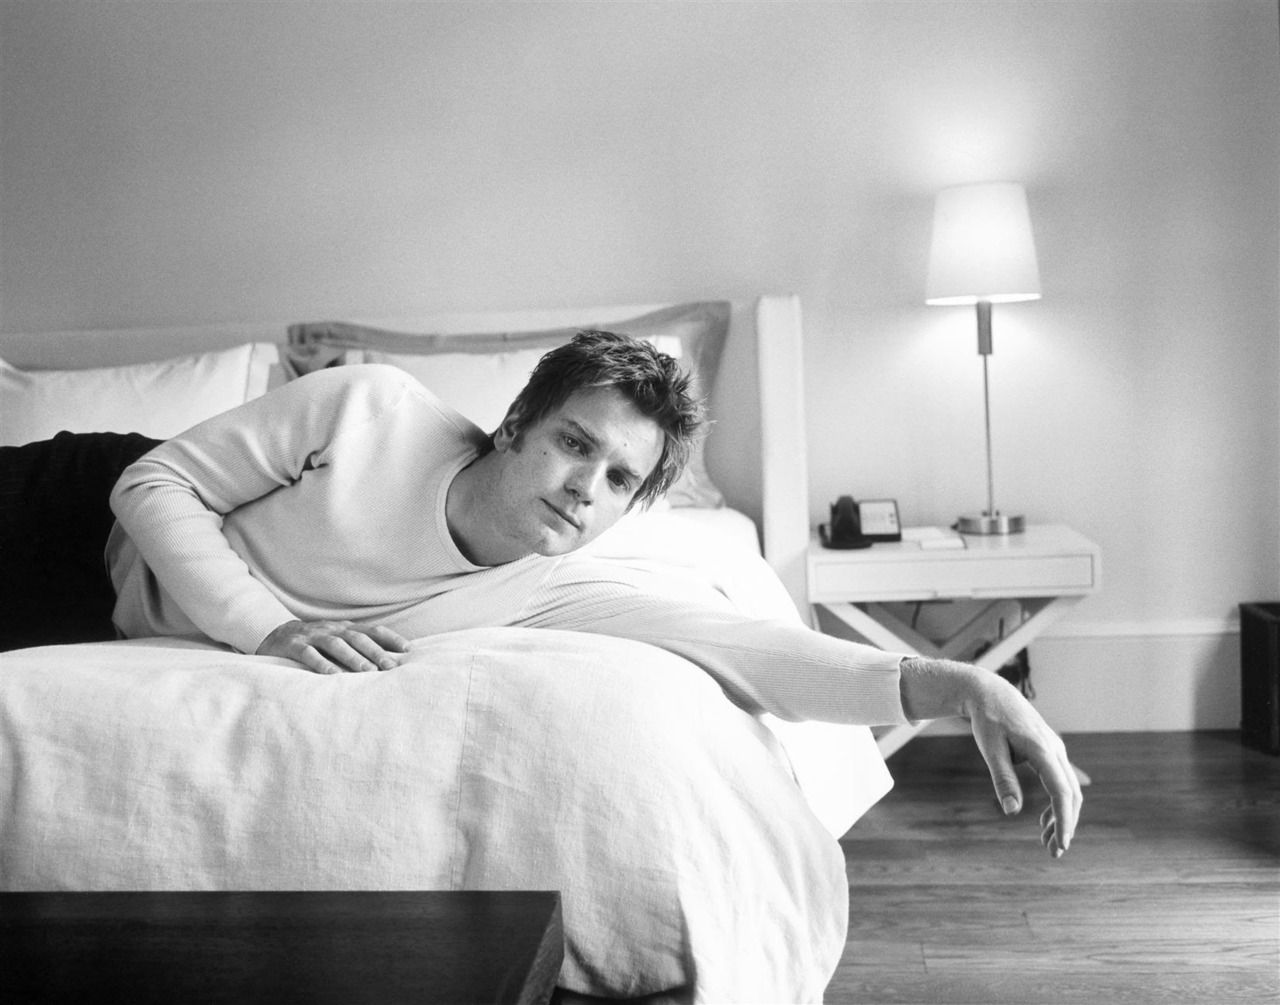 Ewan McGregor photographed by John Huba